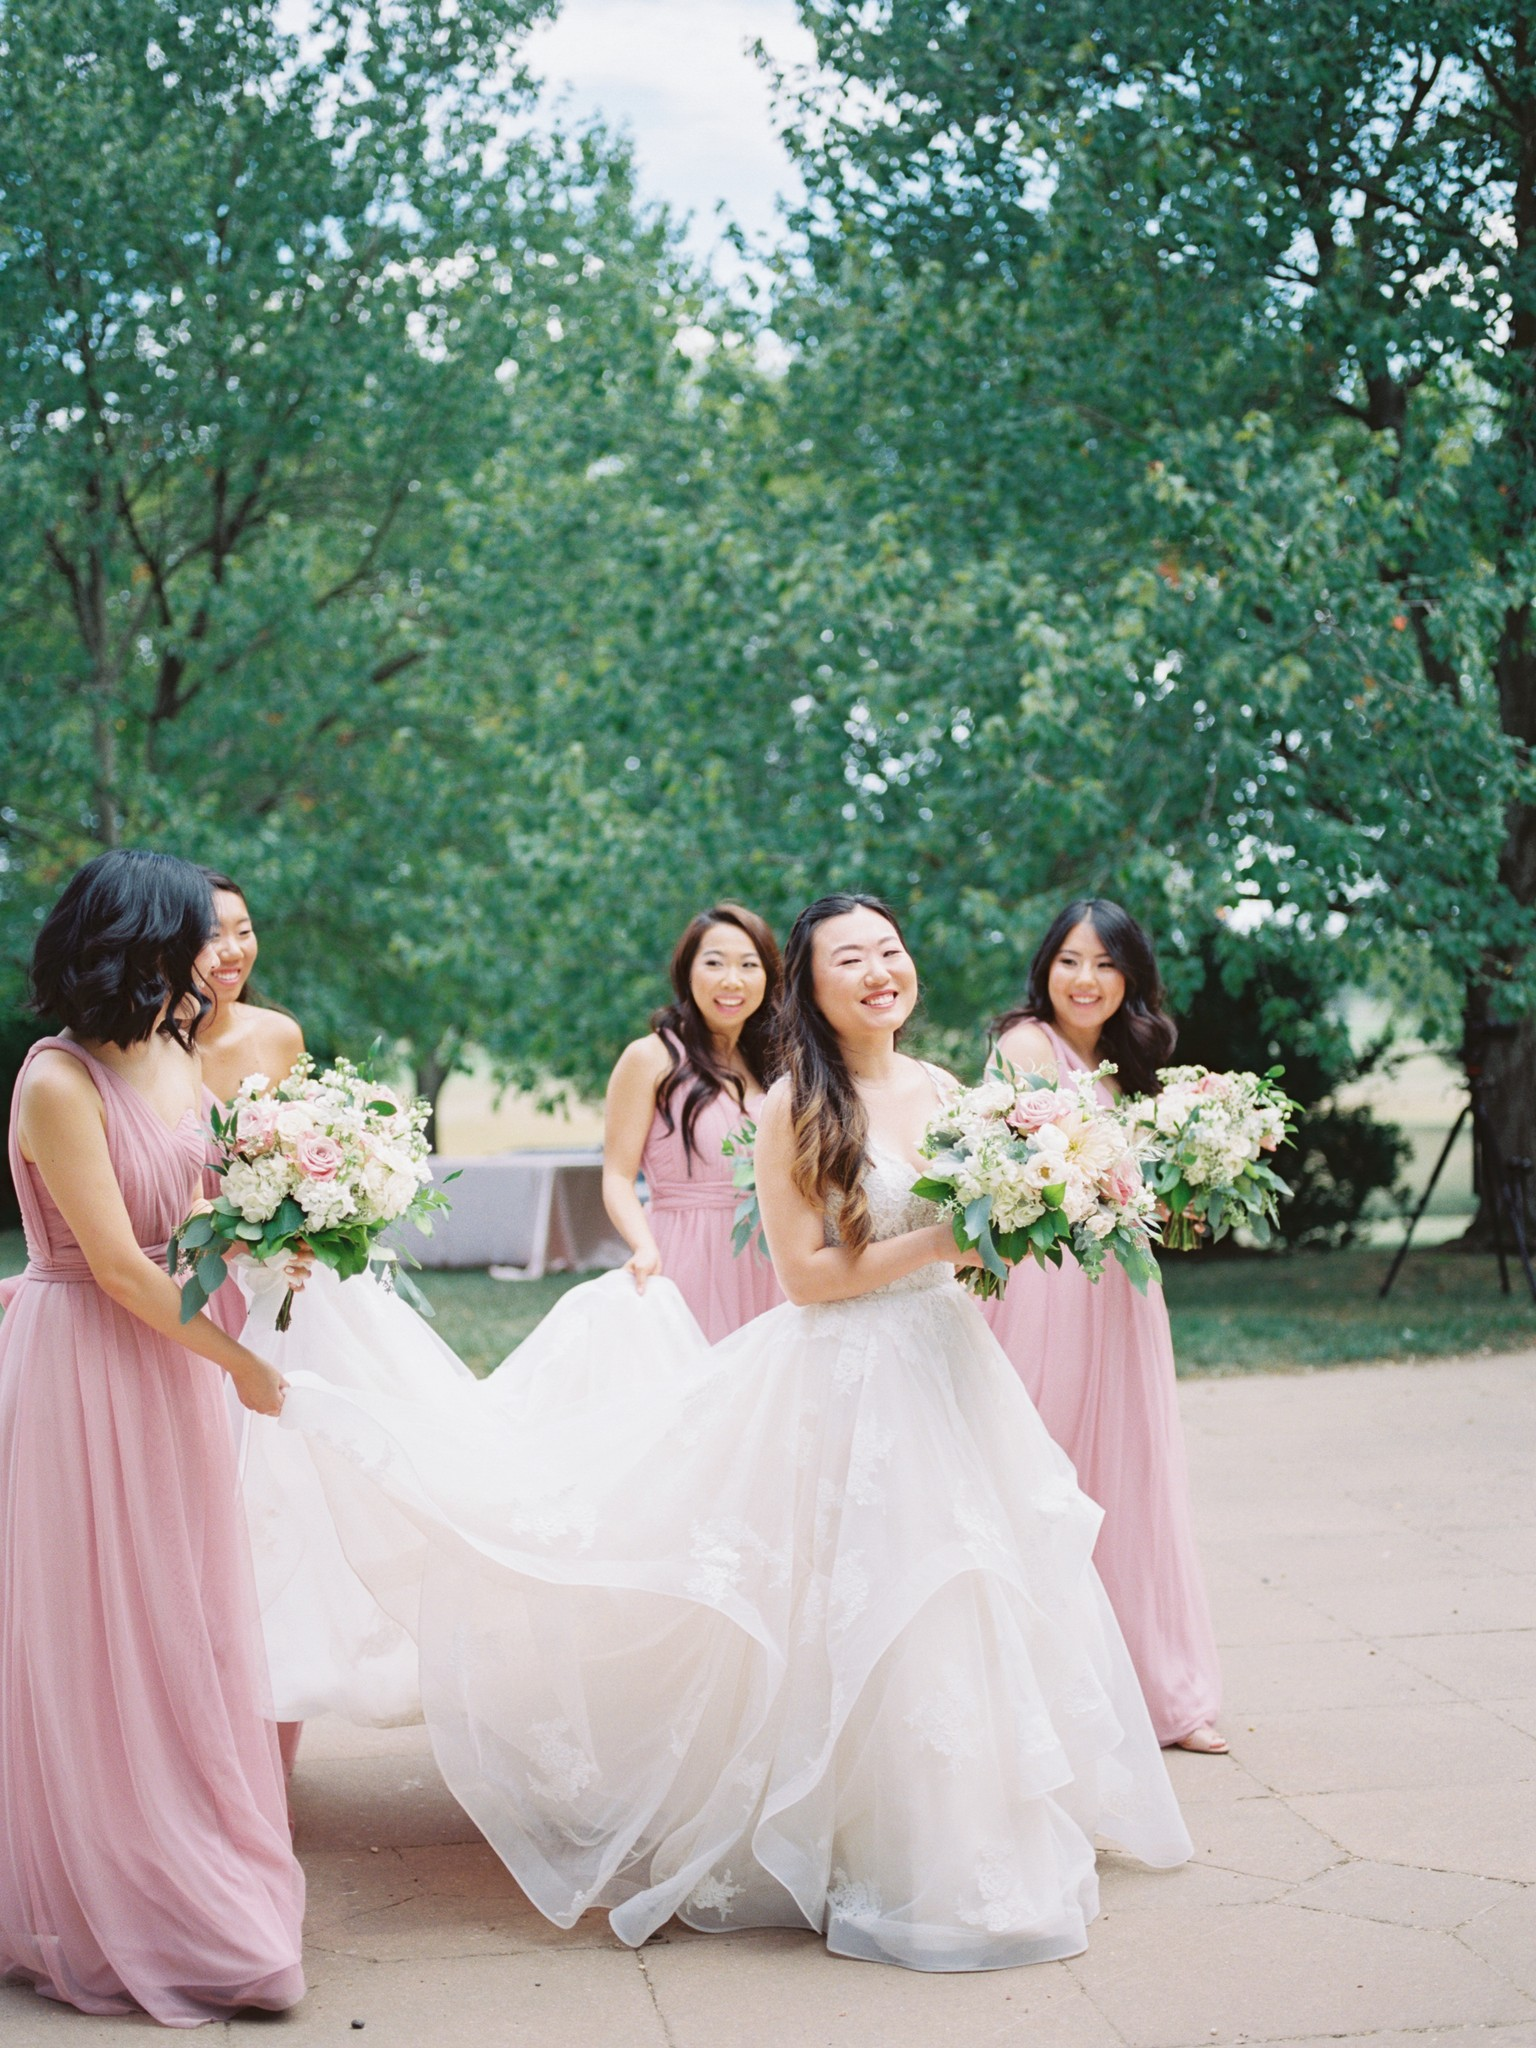 VA-Great-Marsh-Estate-Summer-Wedding-Blush-45.jpg